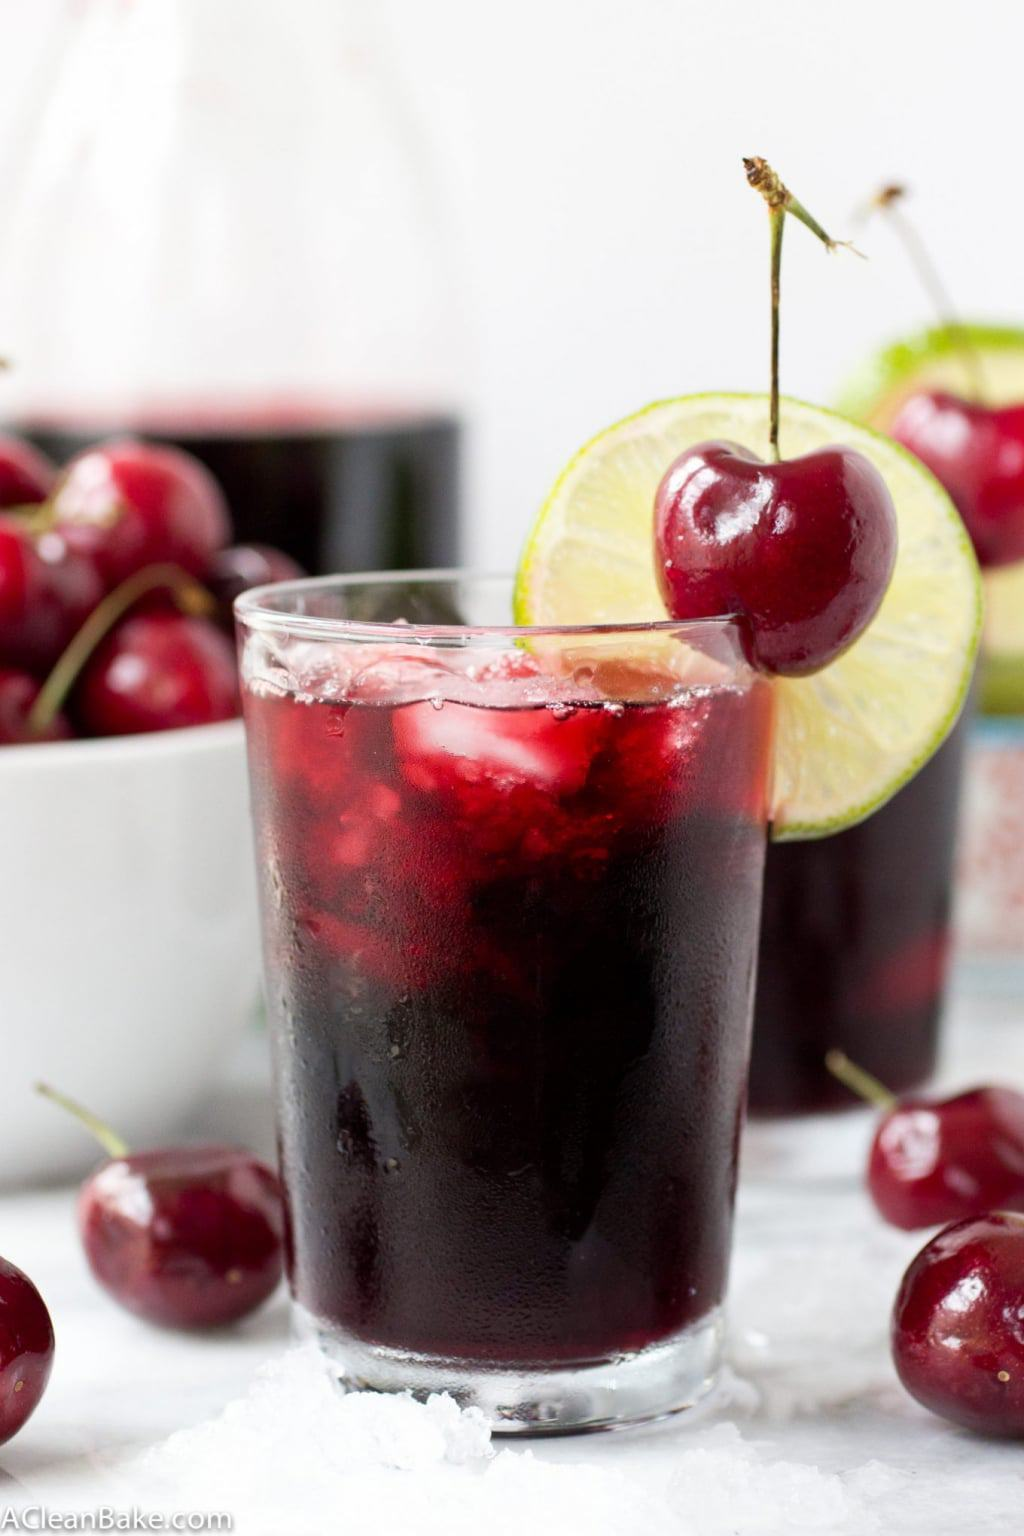 Cherry Lime Slushie (Gluten Free and Paleo)